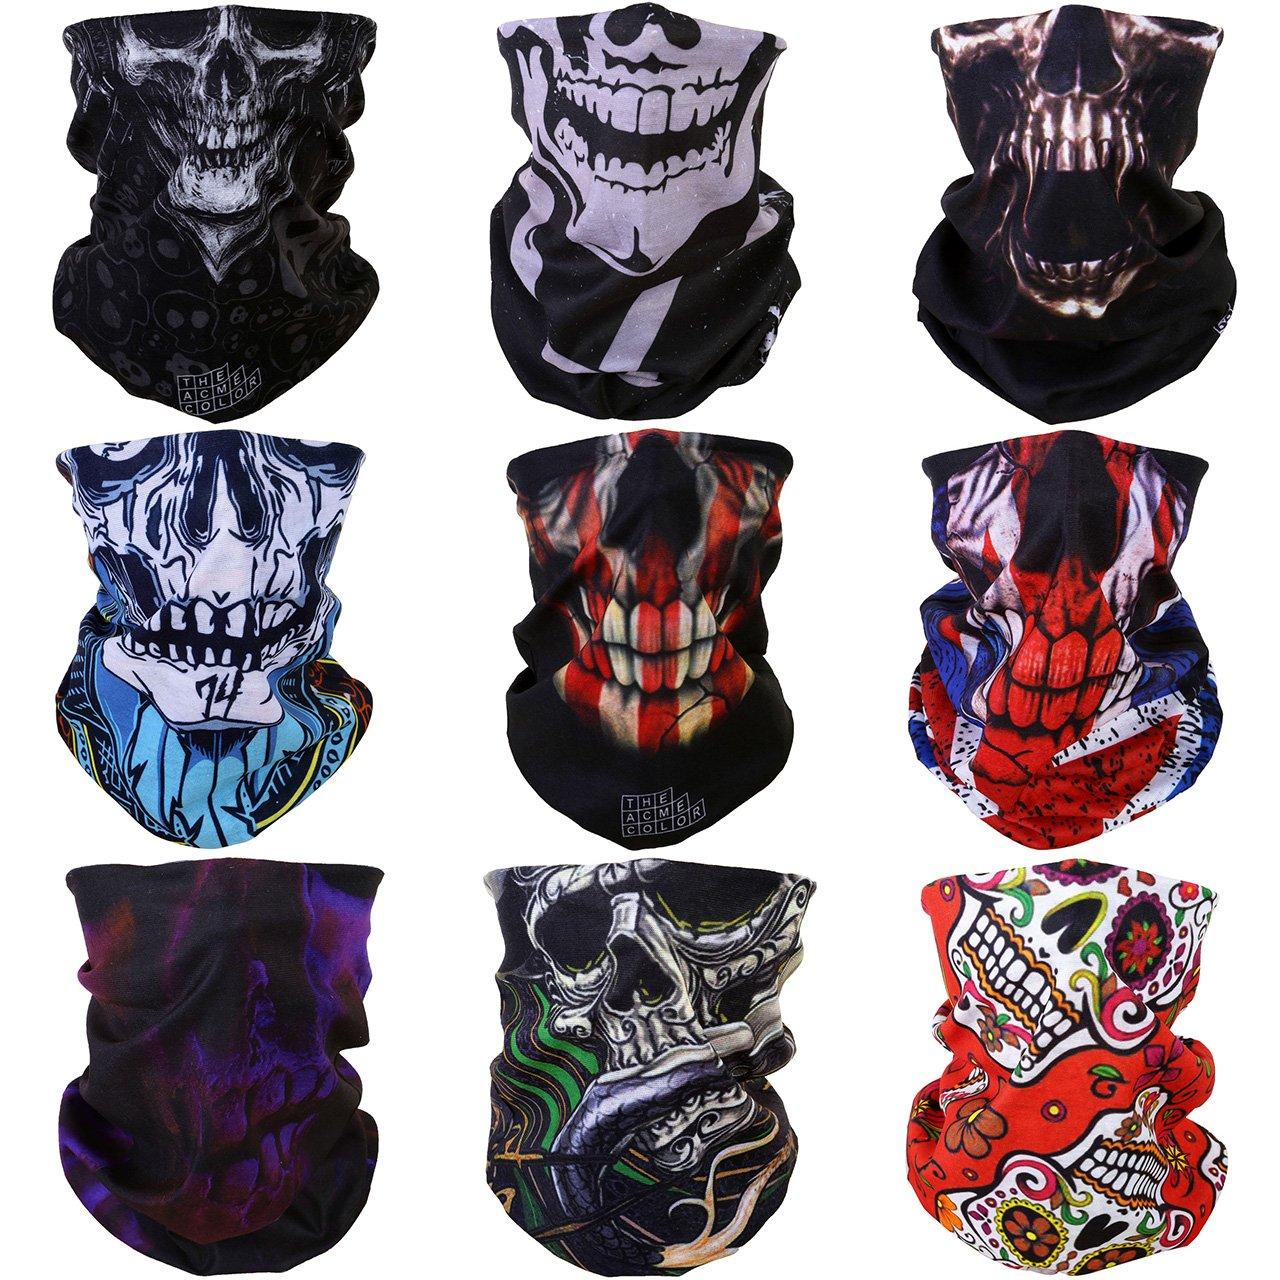 Headband Banbana, ACBungji Magic Motorcycle Headwear Outdoor Sport Seamless Tube Half Face Mask Neck Cover Multifunctional Wrap 9PCS Dark Color Series